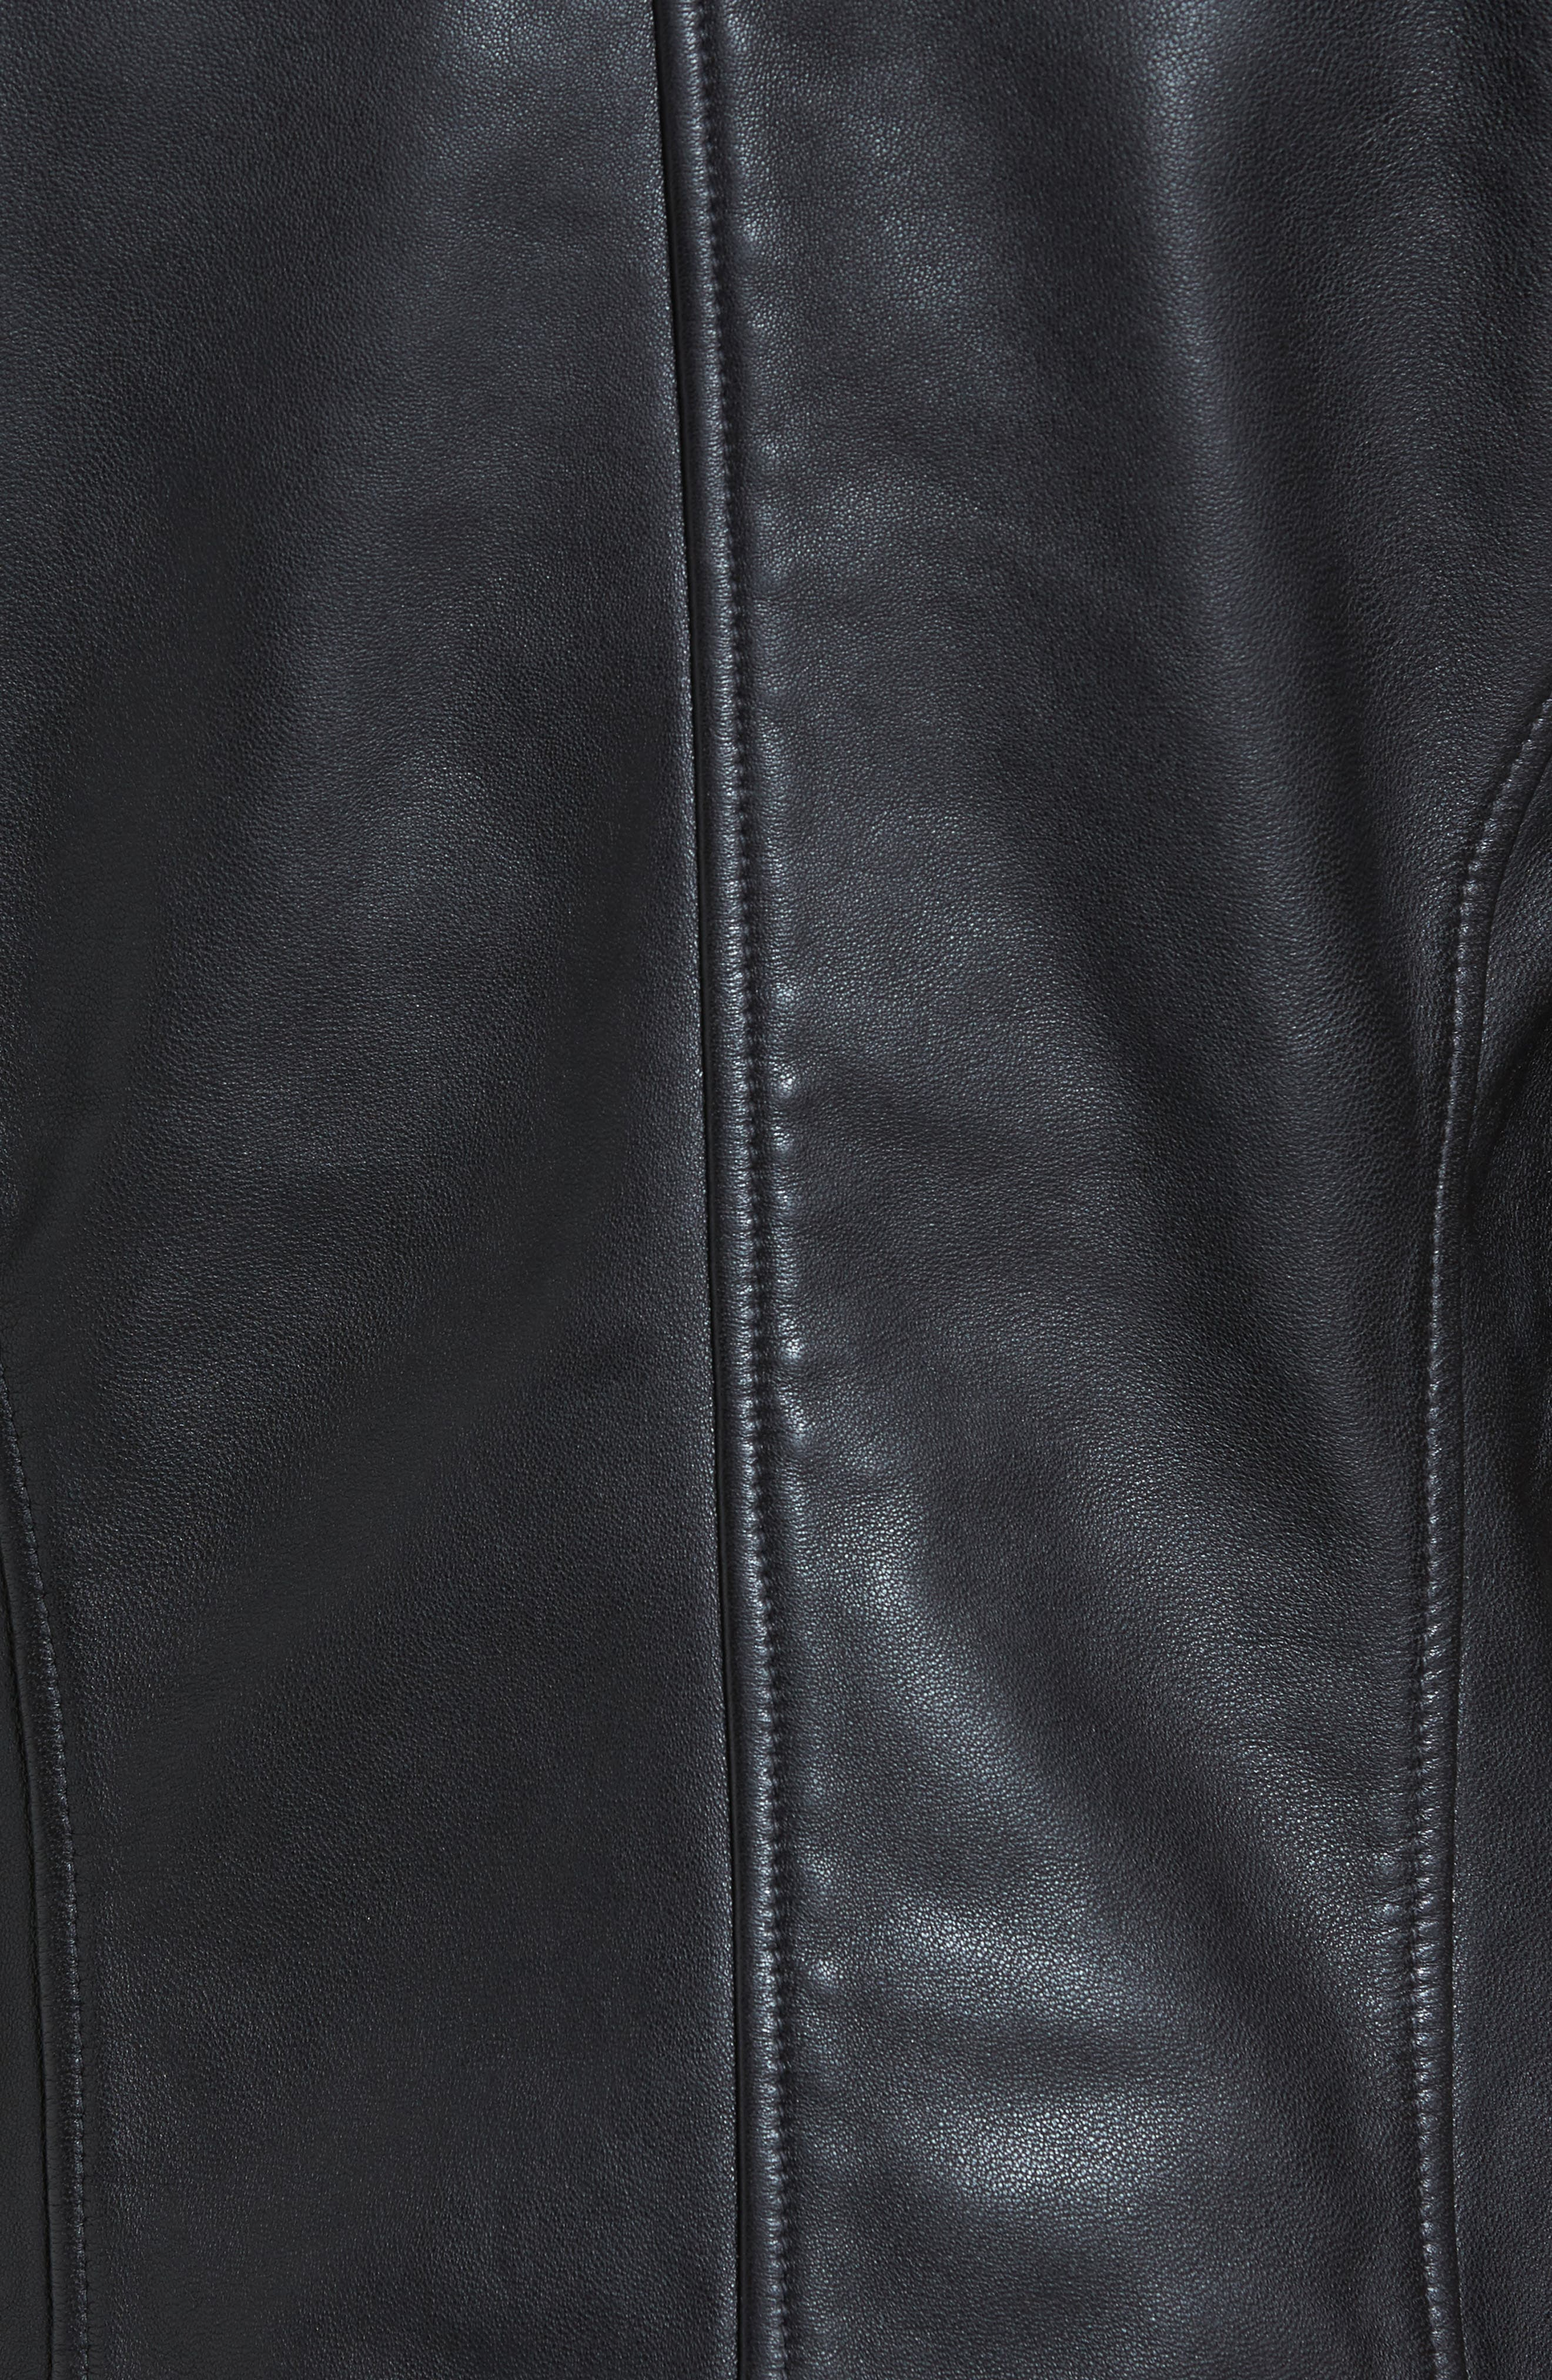 Studded Leather Jacket,                             Alternate thumbnail 6, color,